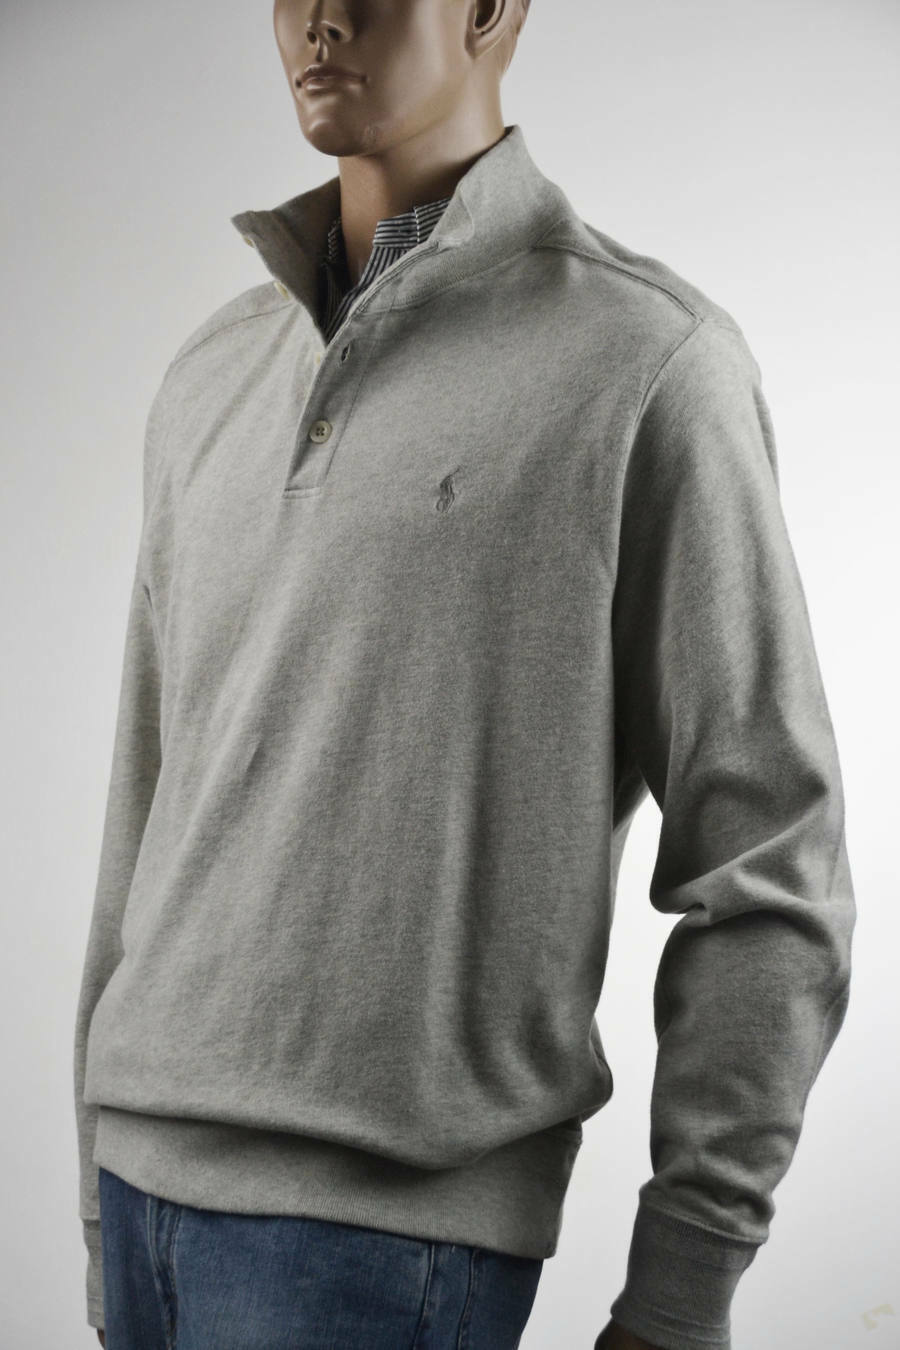 Ralph Lauren grau Half-Buttoned Cotton Sweater Sweatshirt grau Pony -XXlarge-NWT